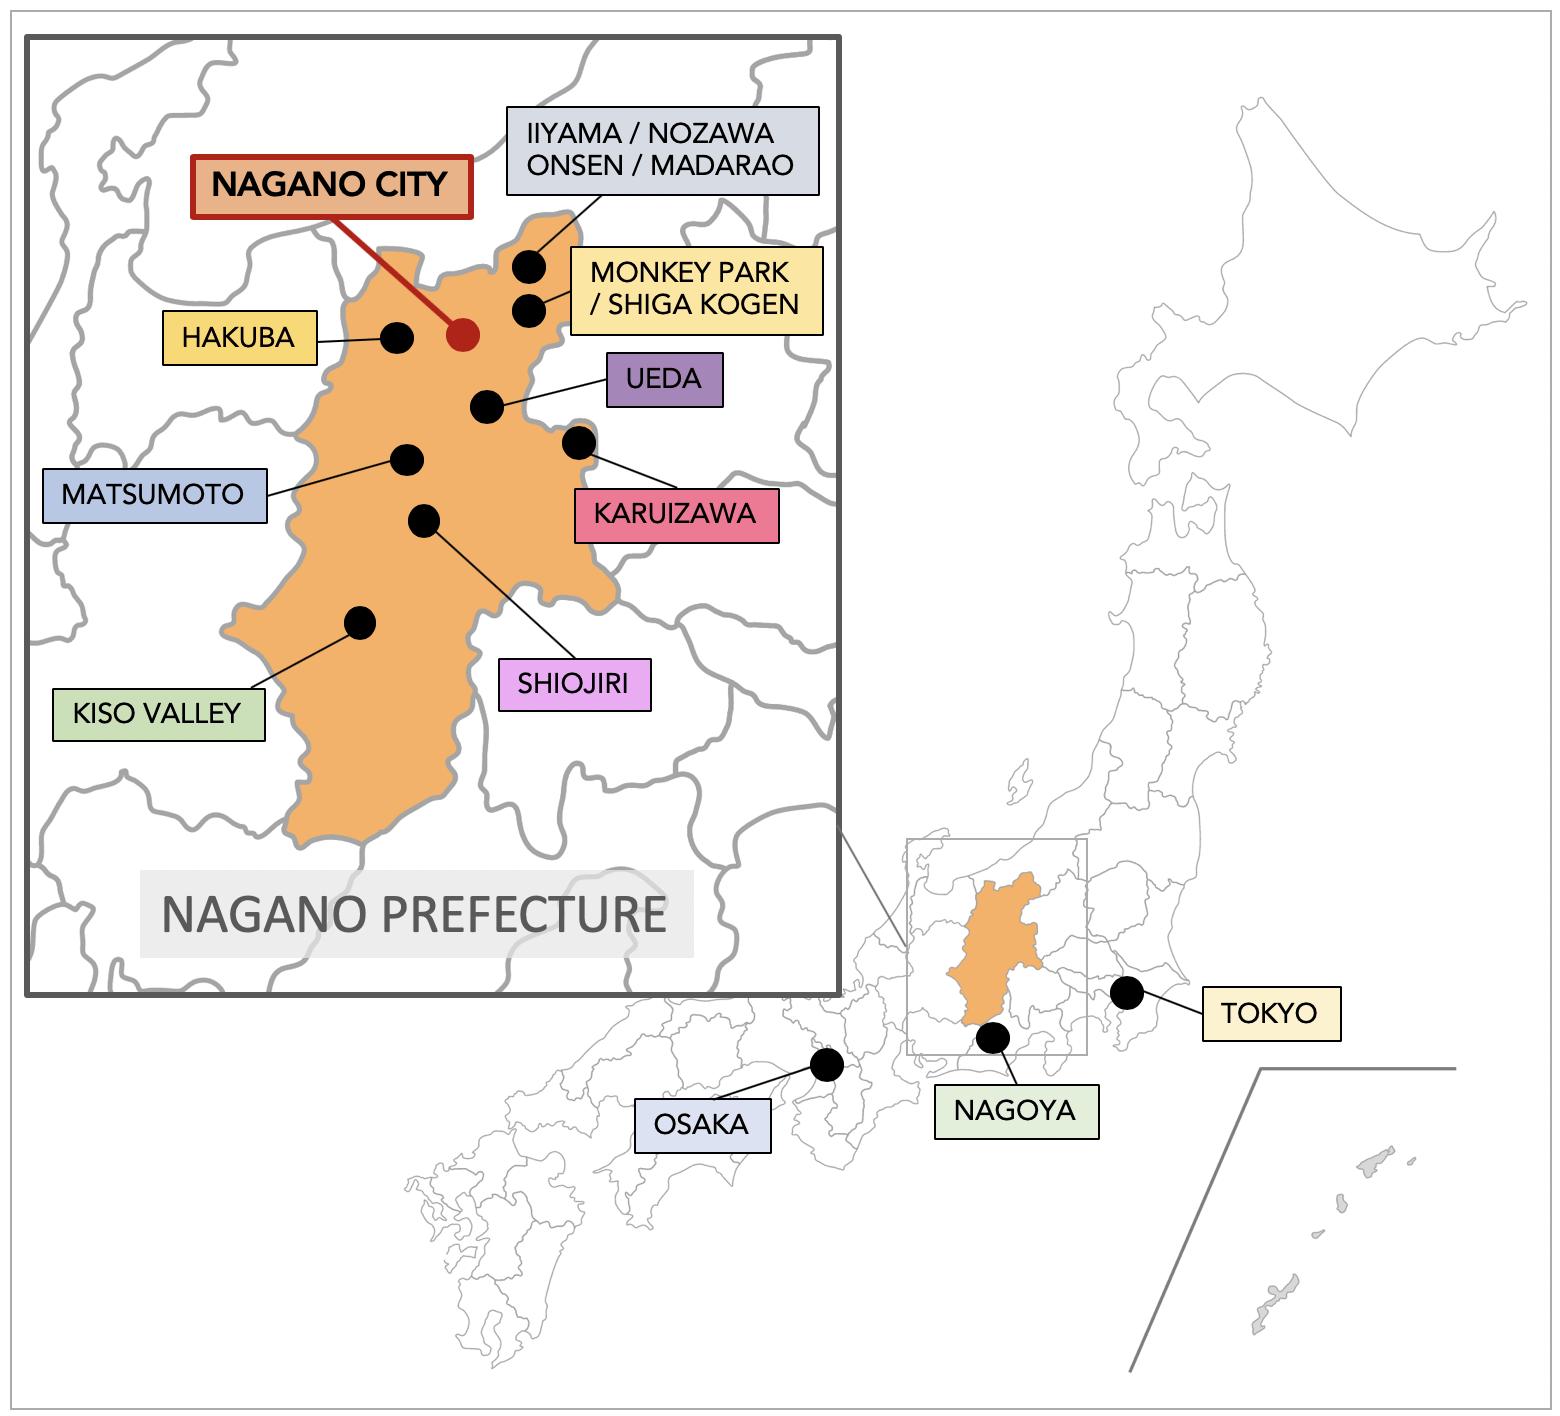 nagano-prefecture-map